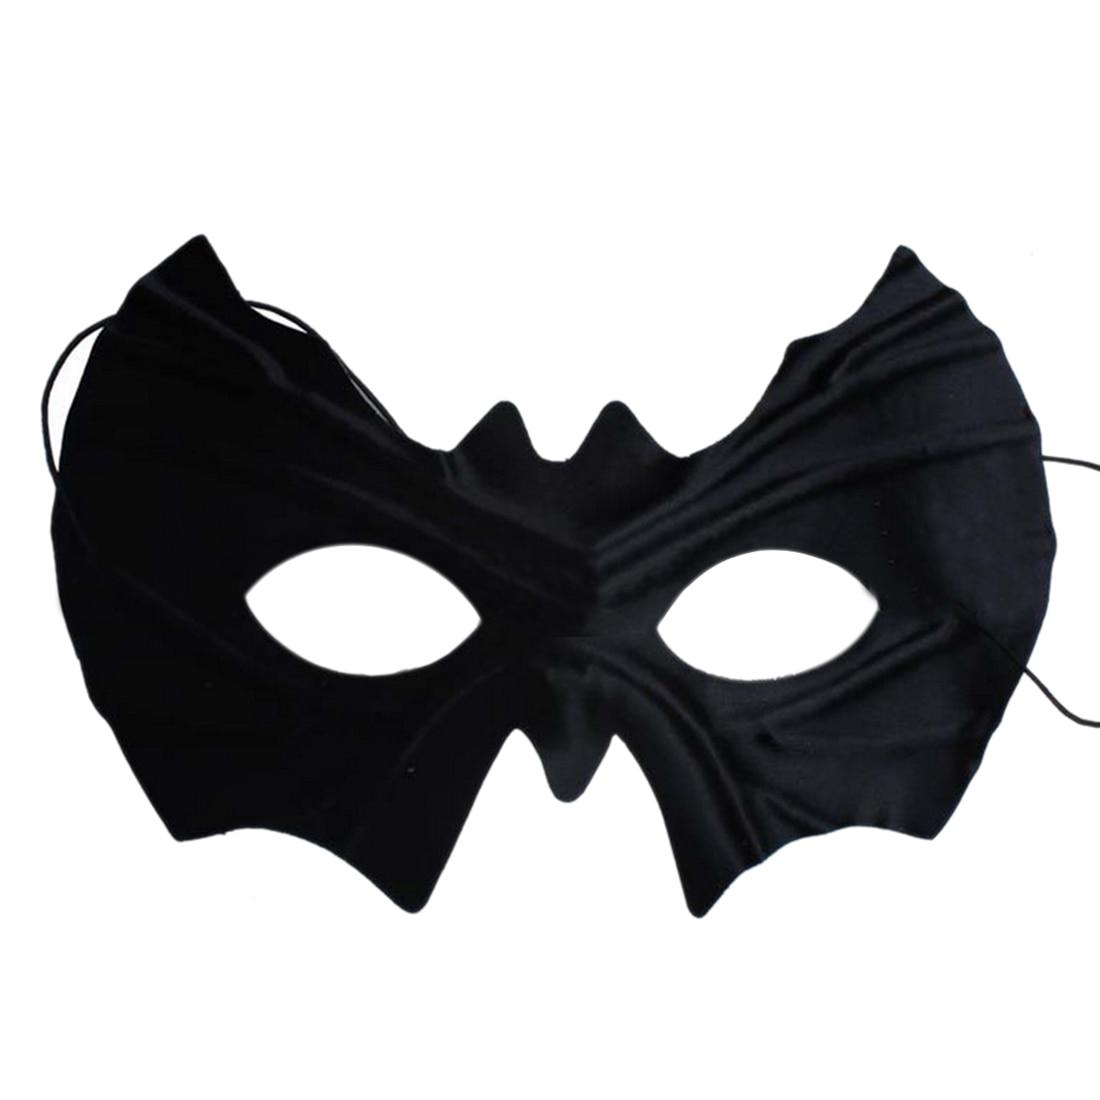 Online Get Cheap Batman Eye Mask -Aliexpress.com | Alibaba Group